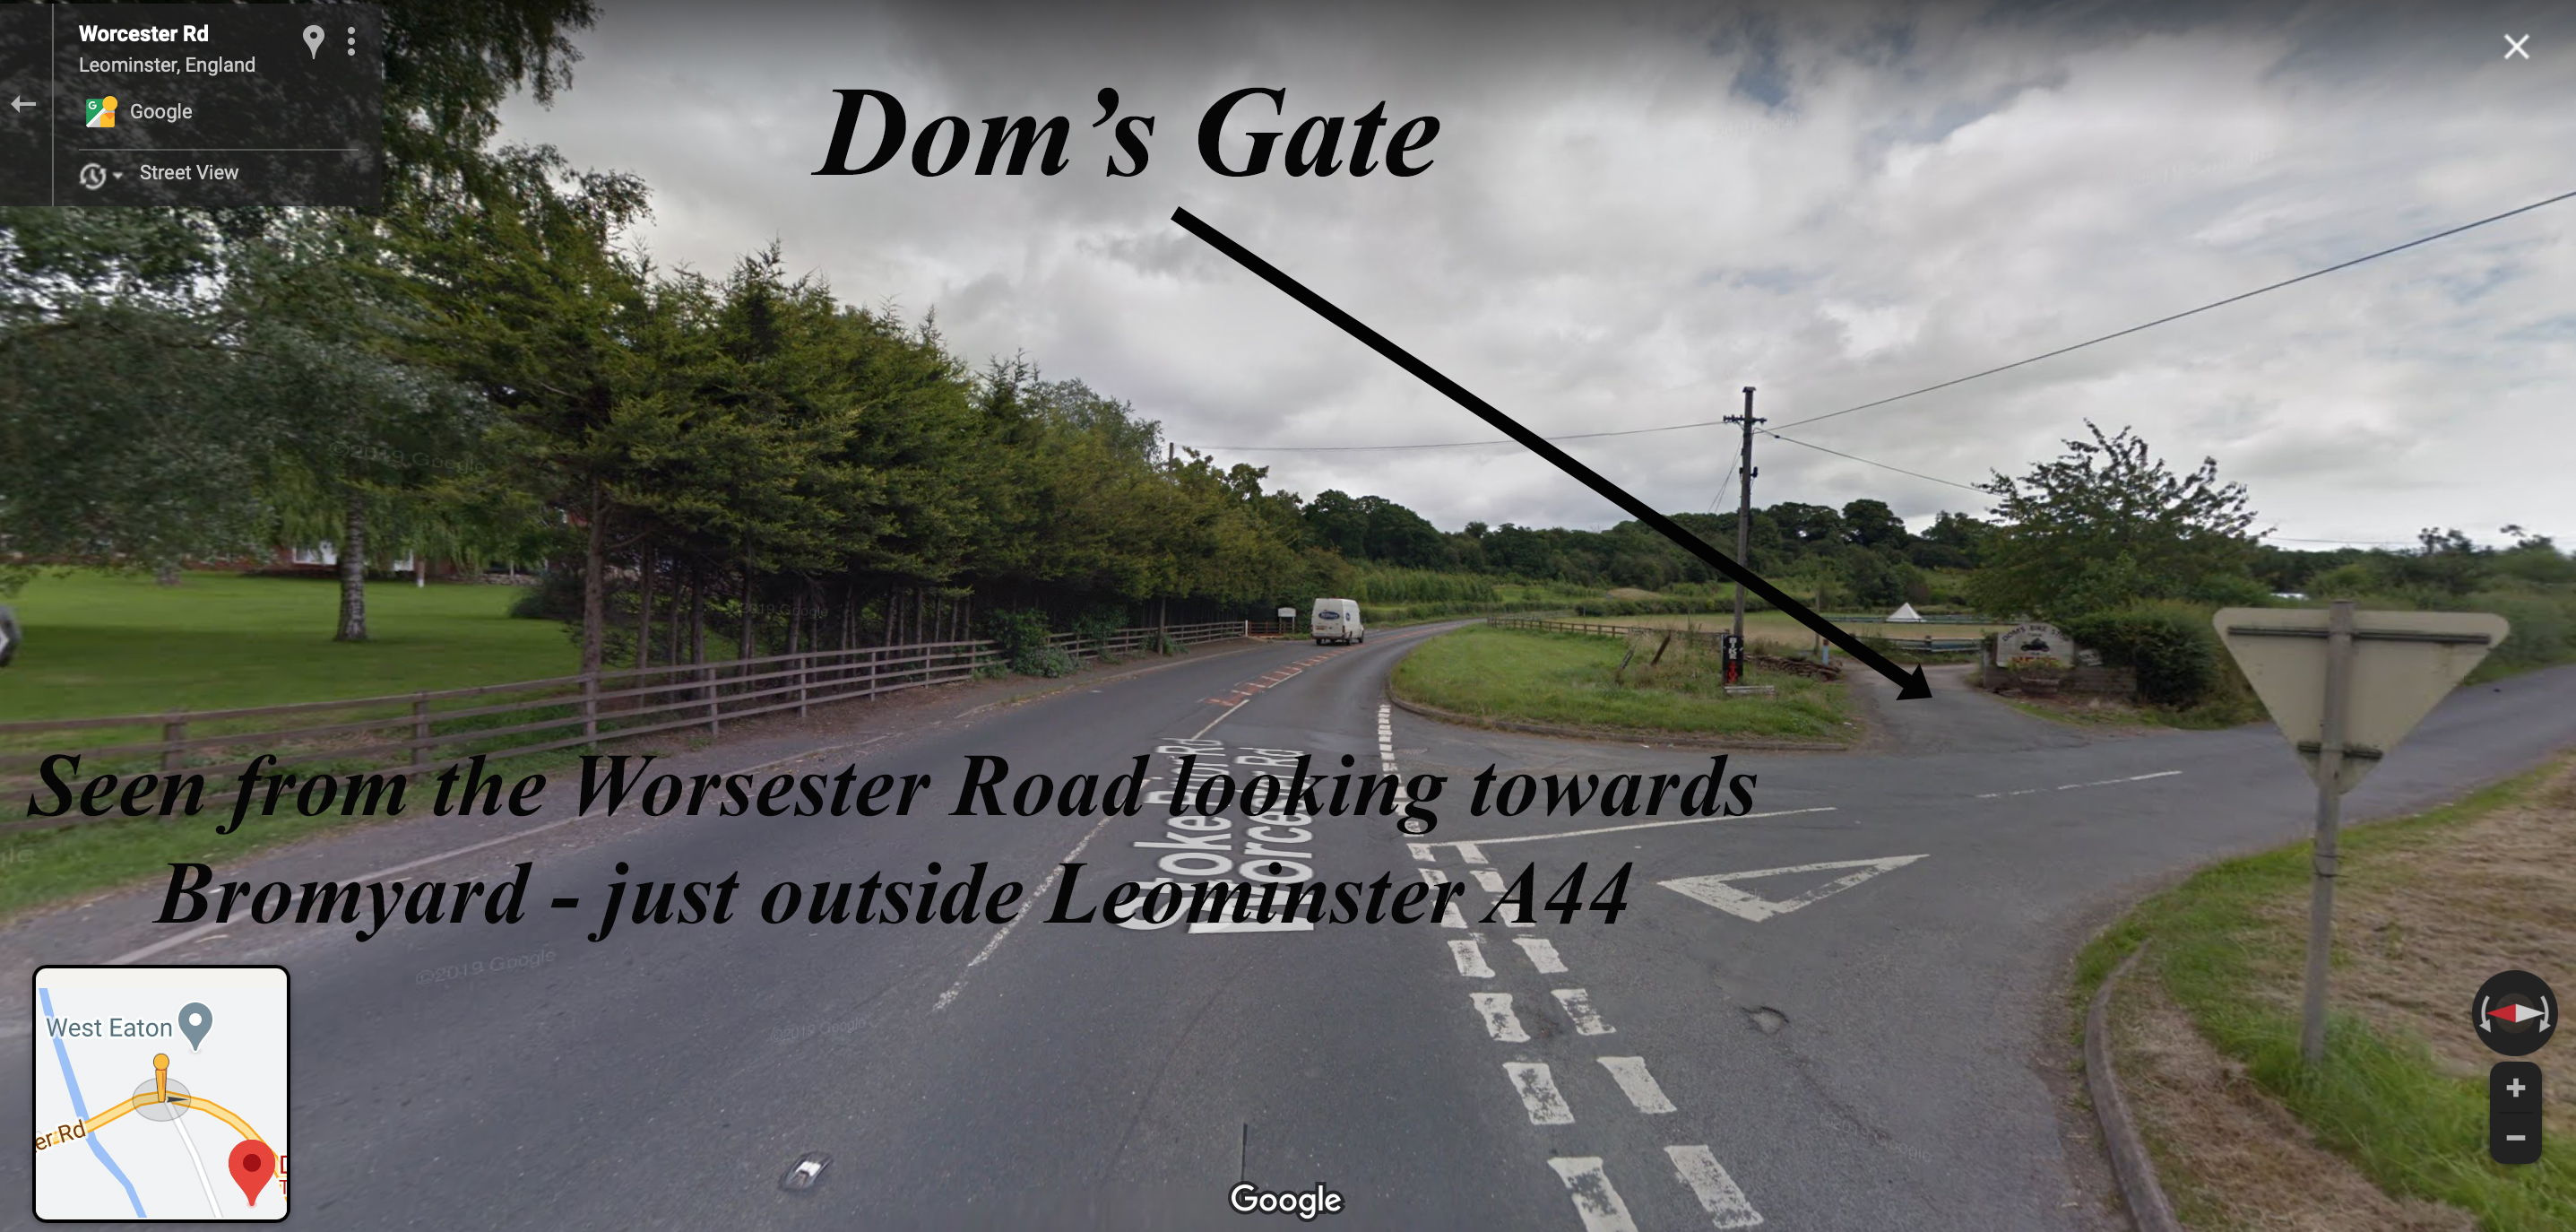 Doms gate.jpg